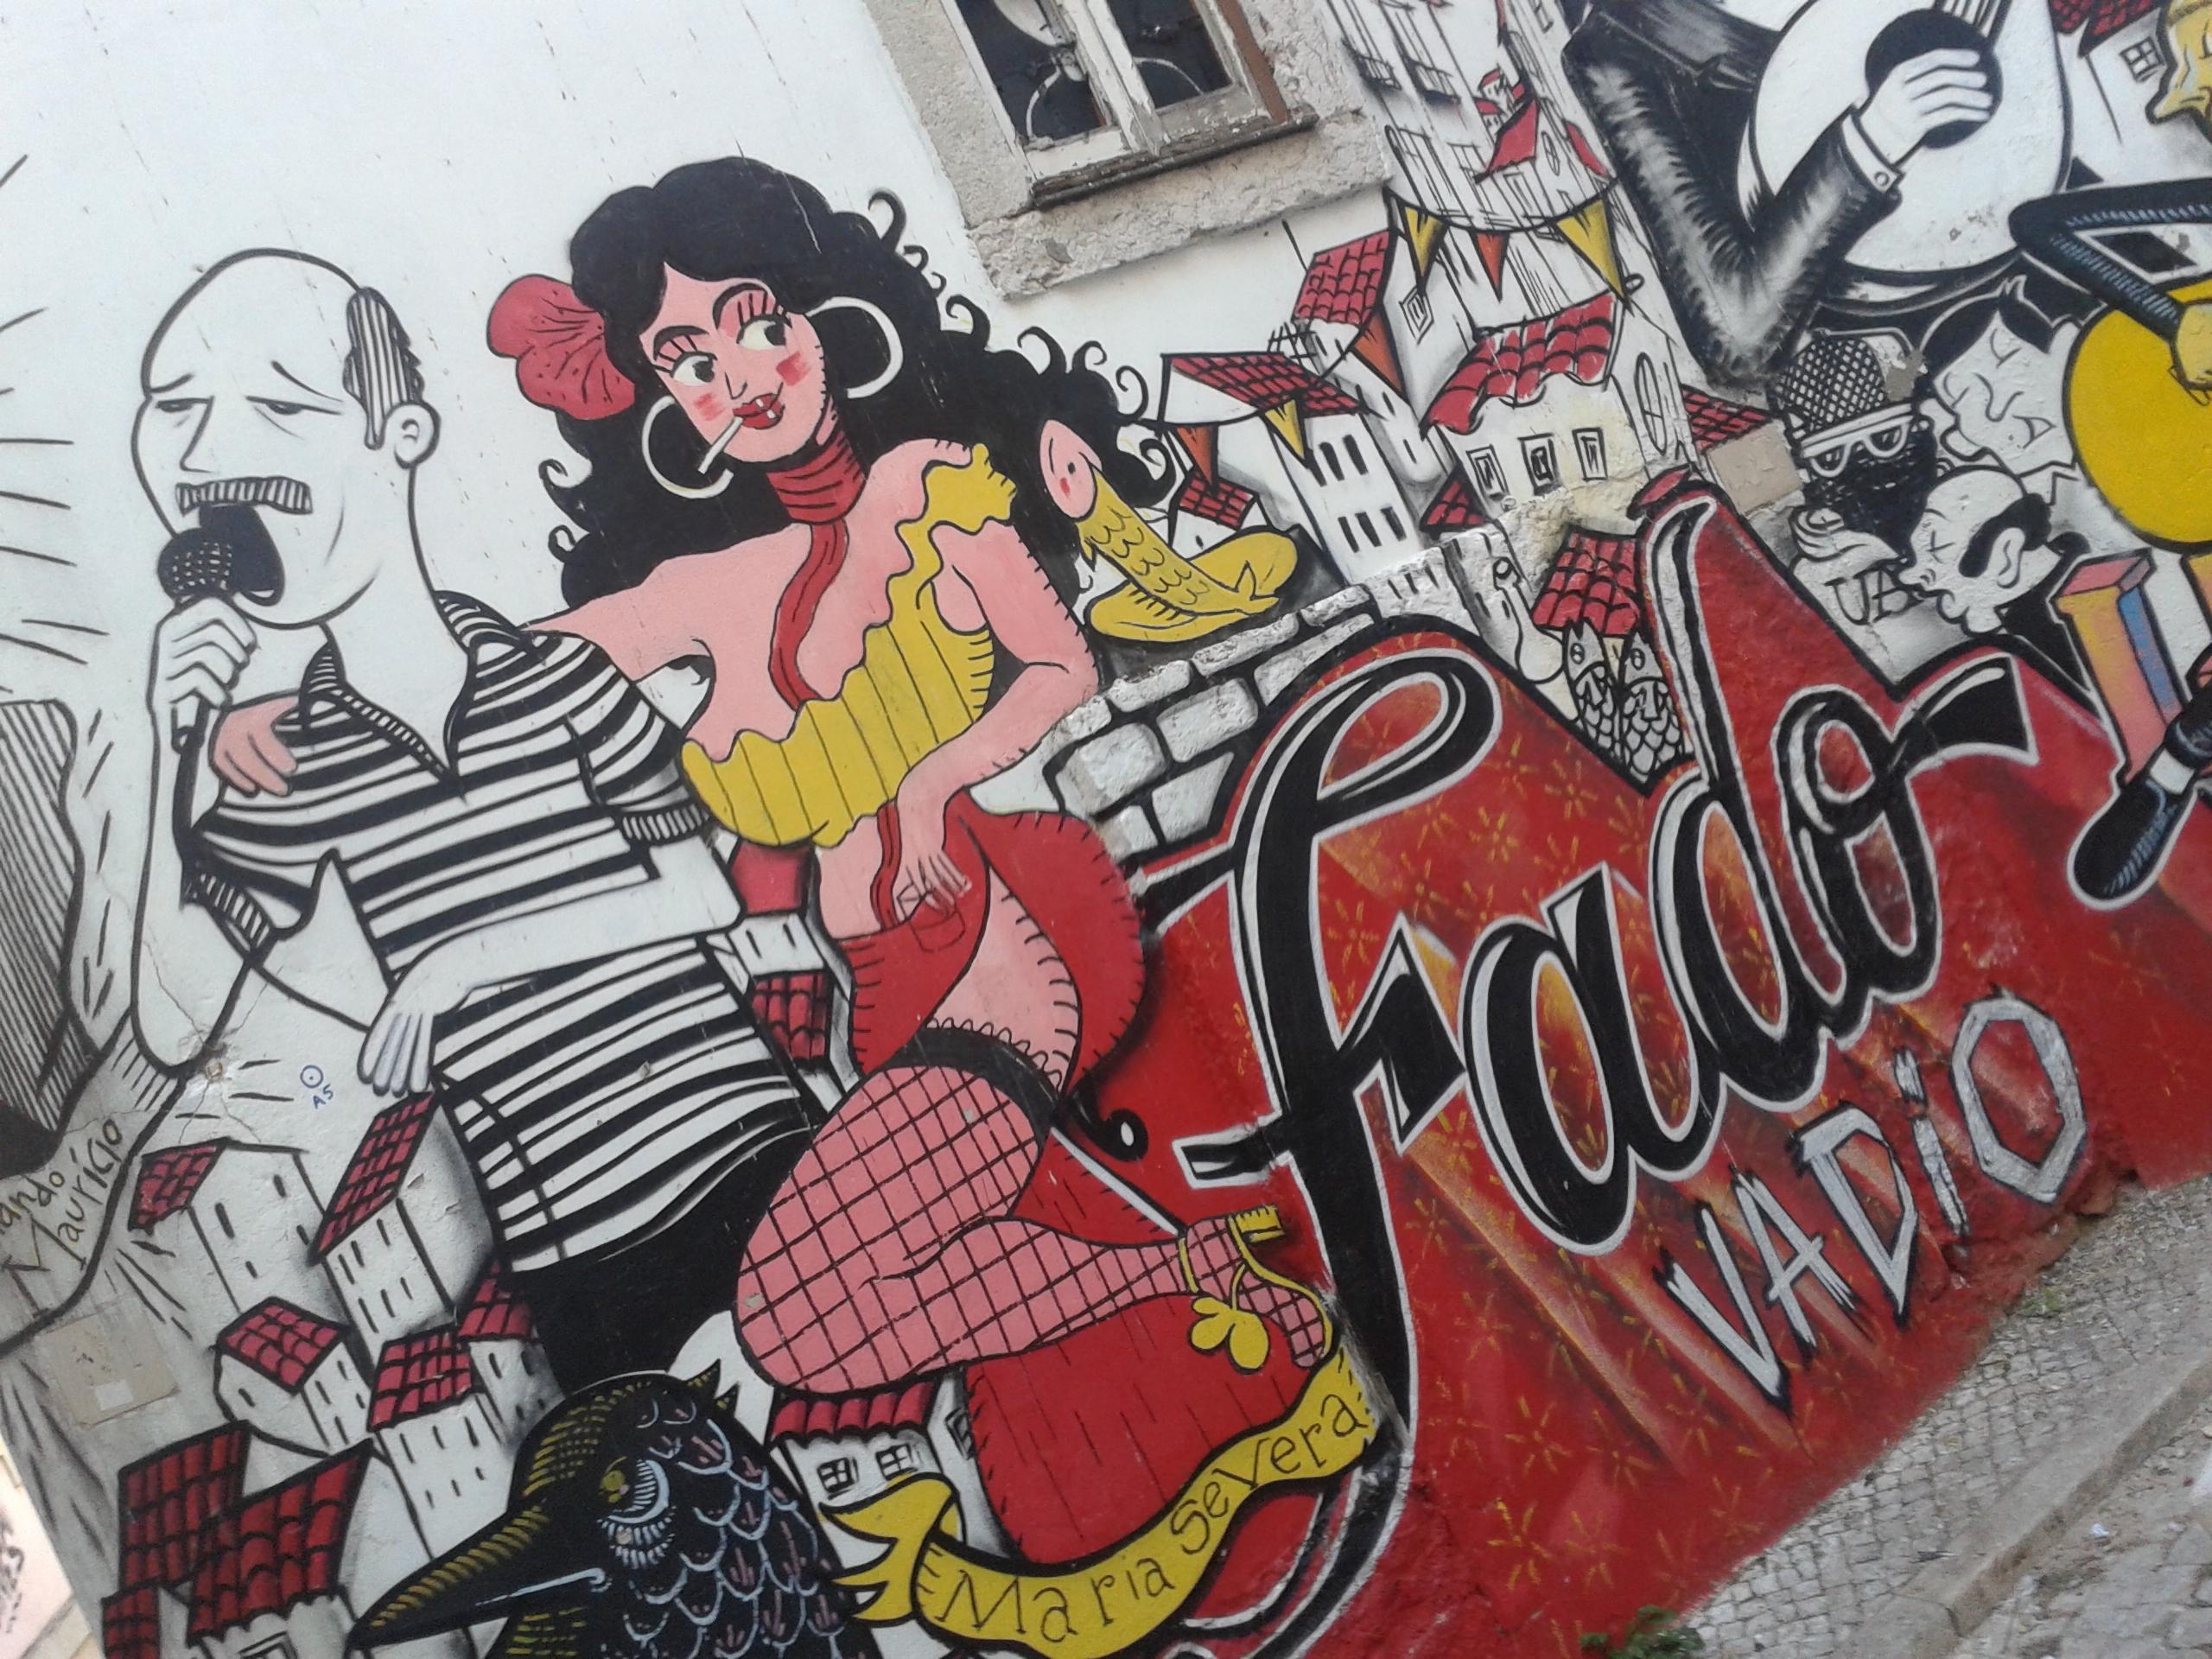 Lisbon street image 02 by Rubén Díez